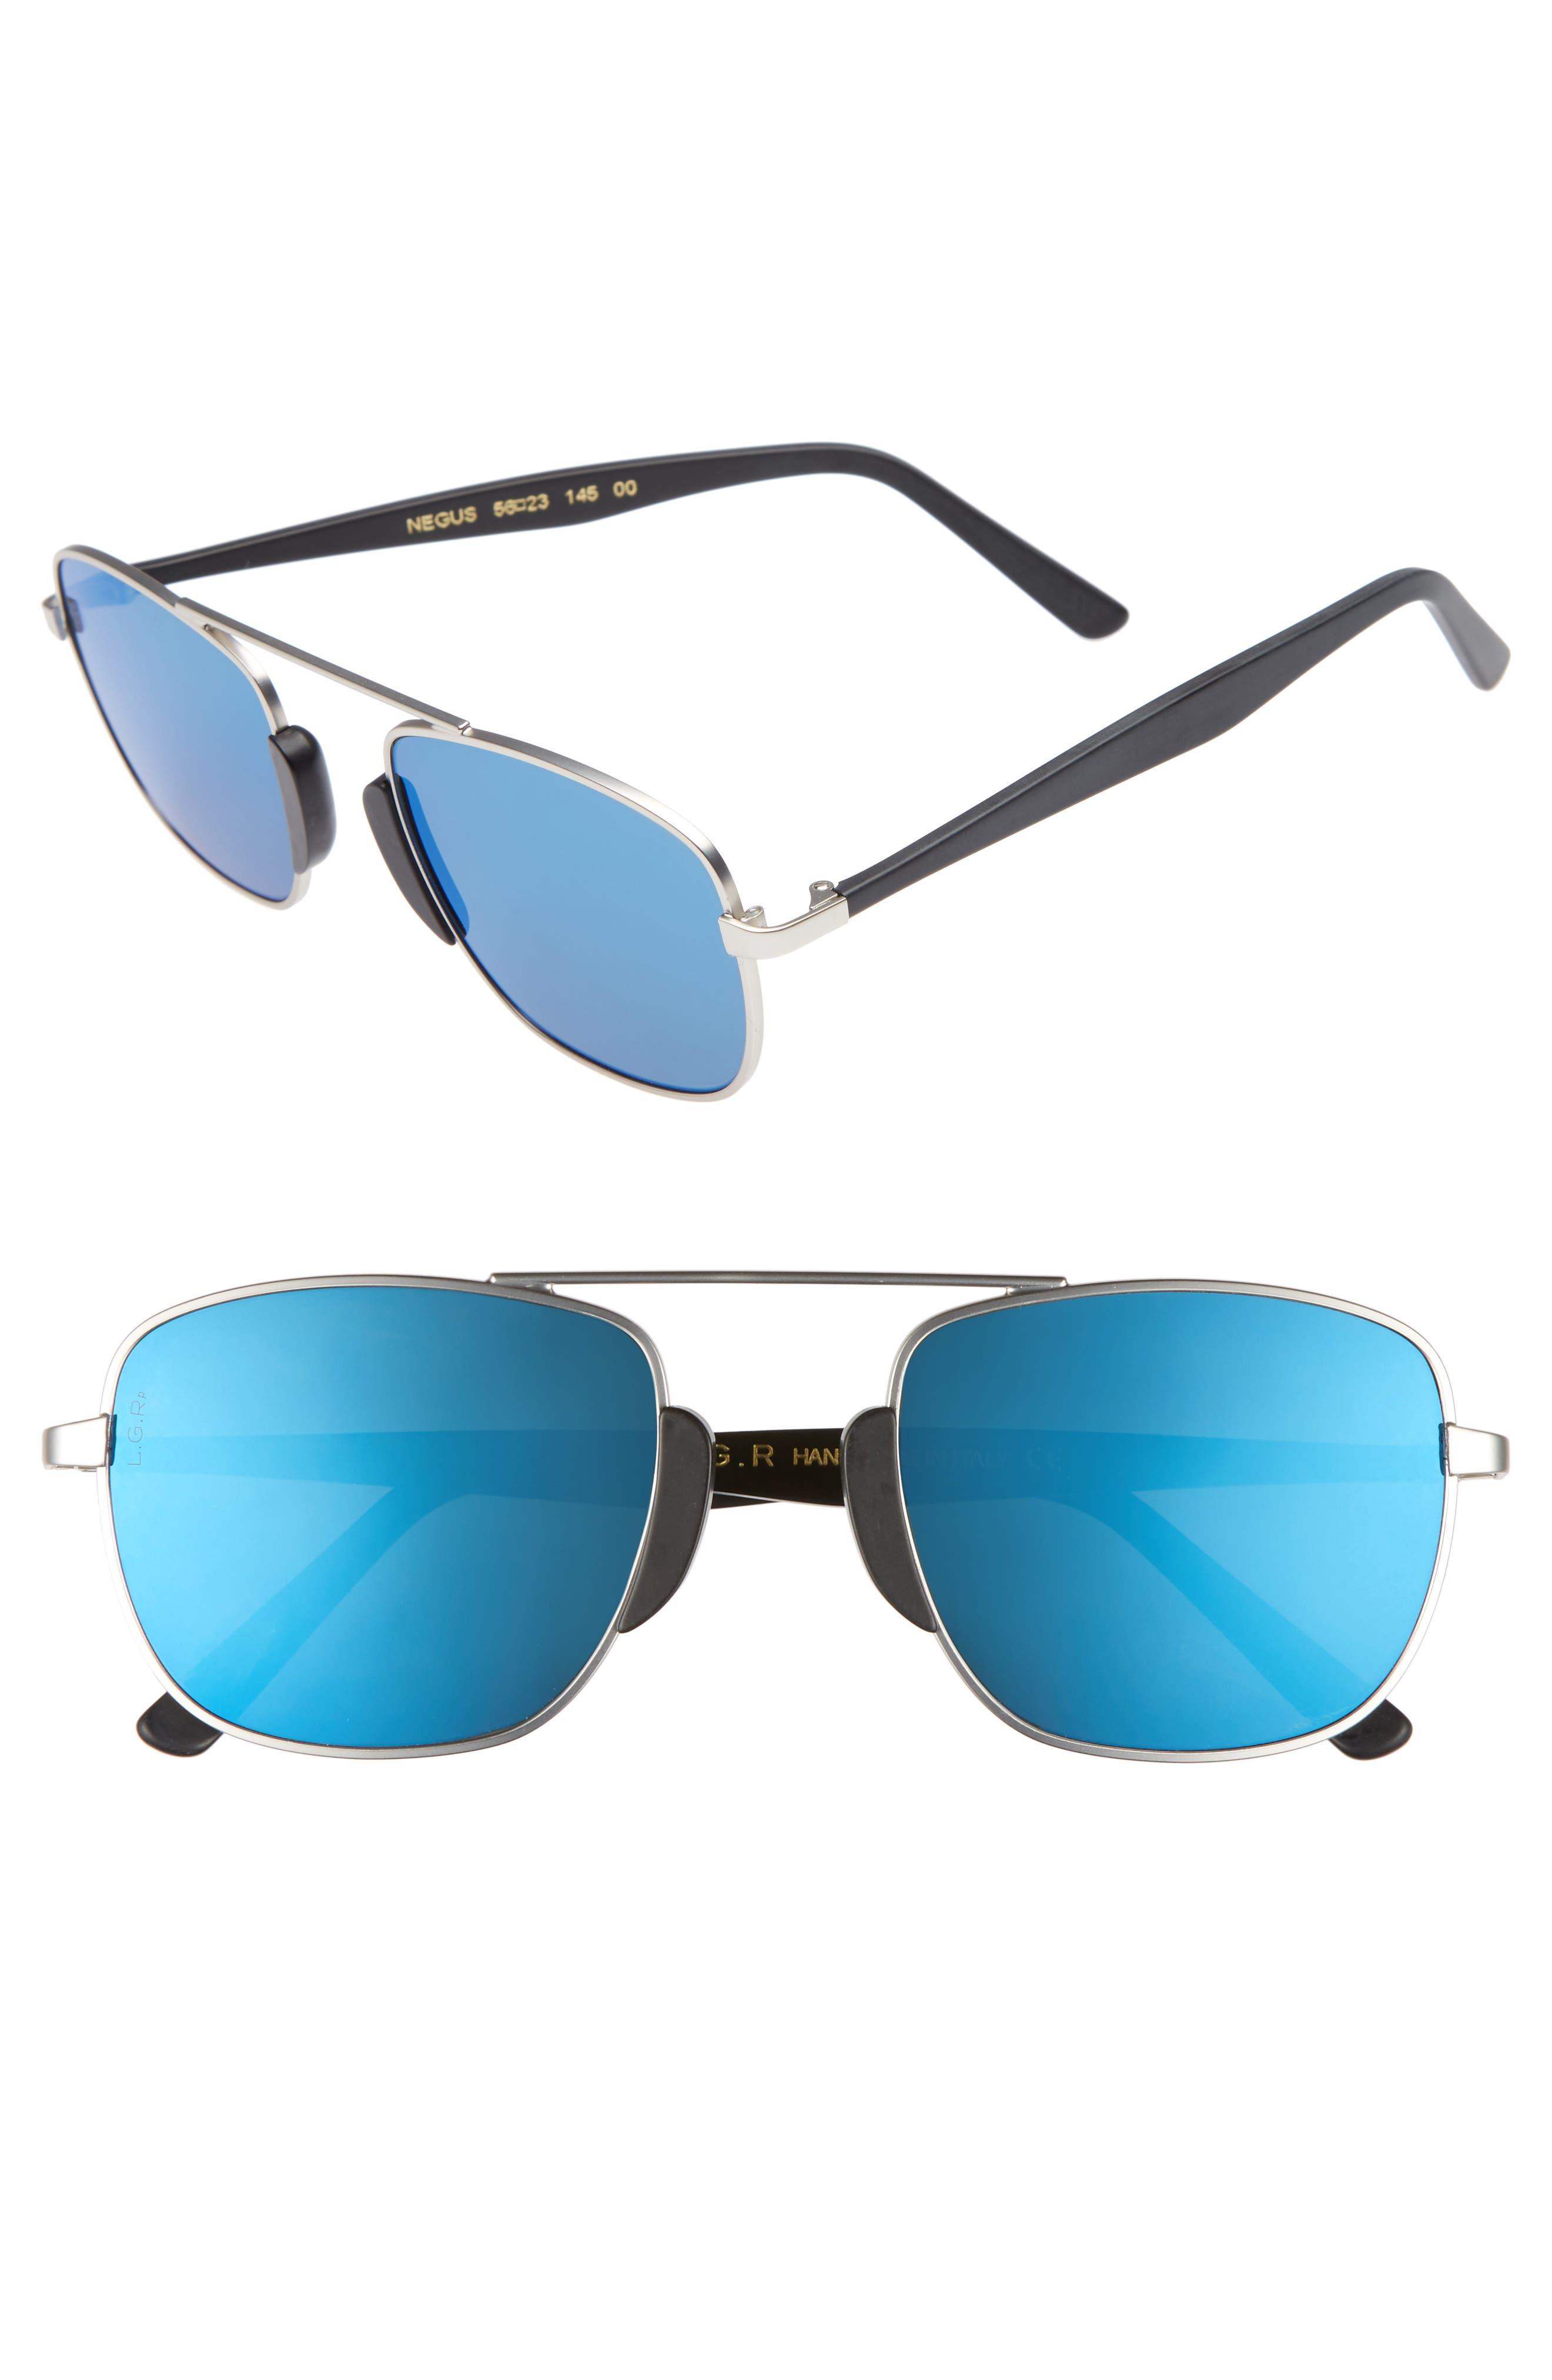 Negus 53mm Polarized Sunglasses,                         Main,                         color, Silver Matte/ Blue Mirror